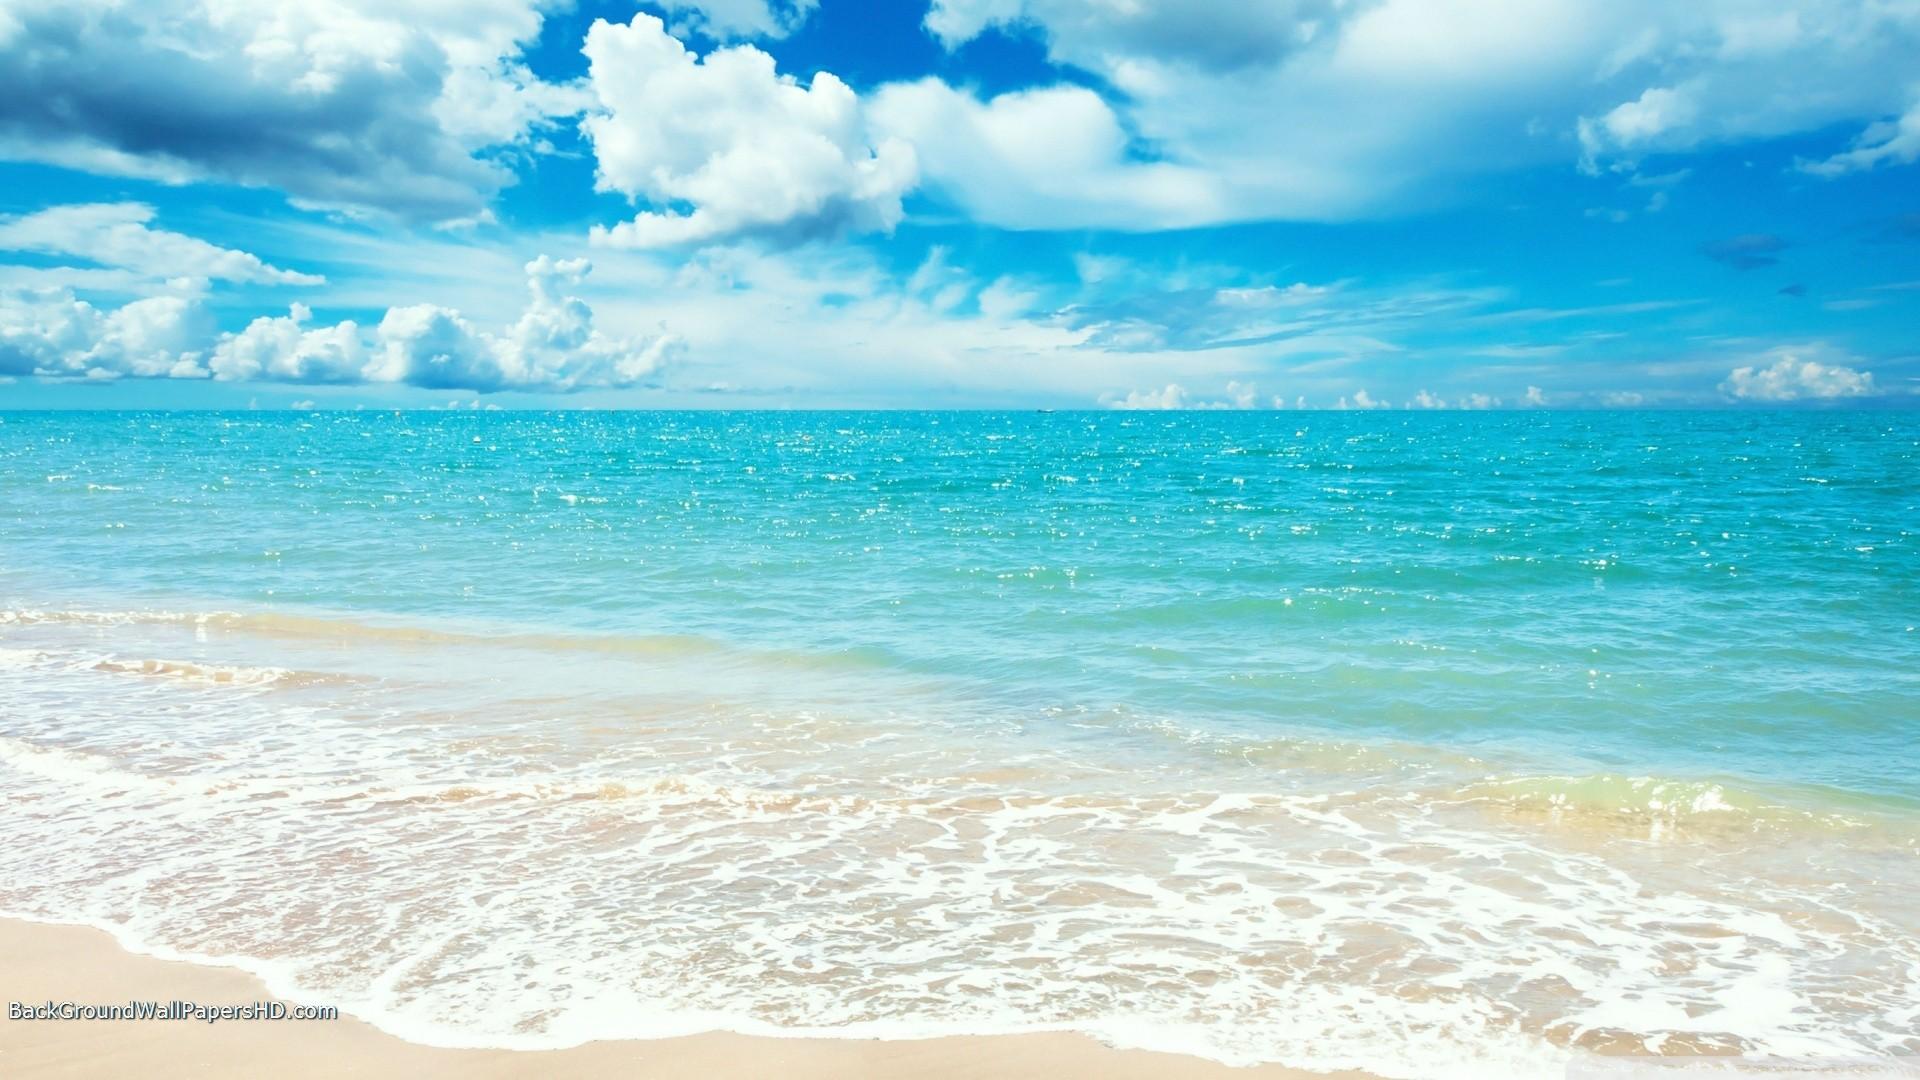 Pretty Beach HD Wallpaper   HD Wallpapers, HD Backgrounds